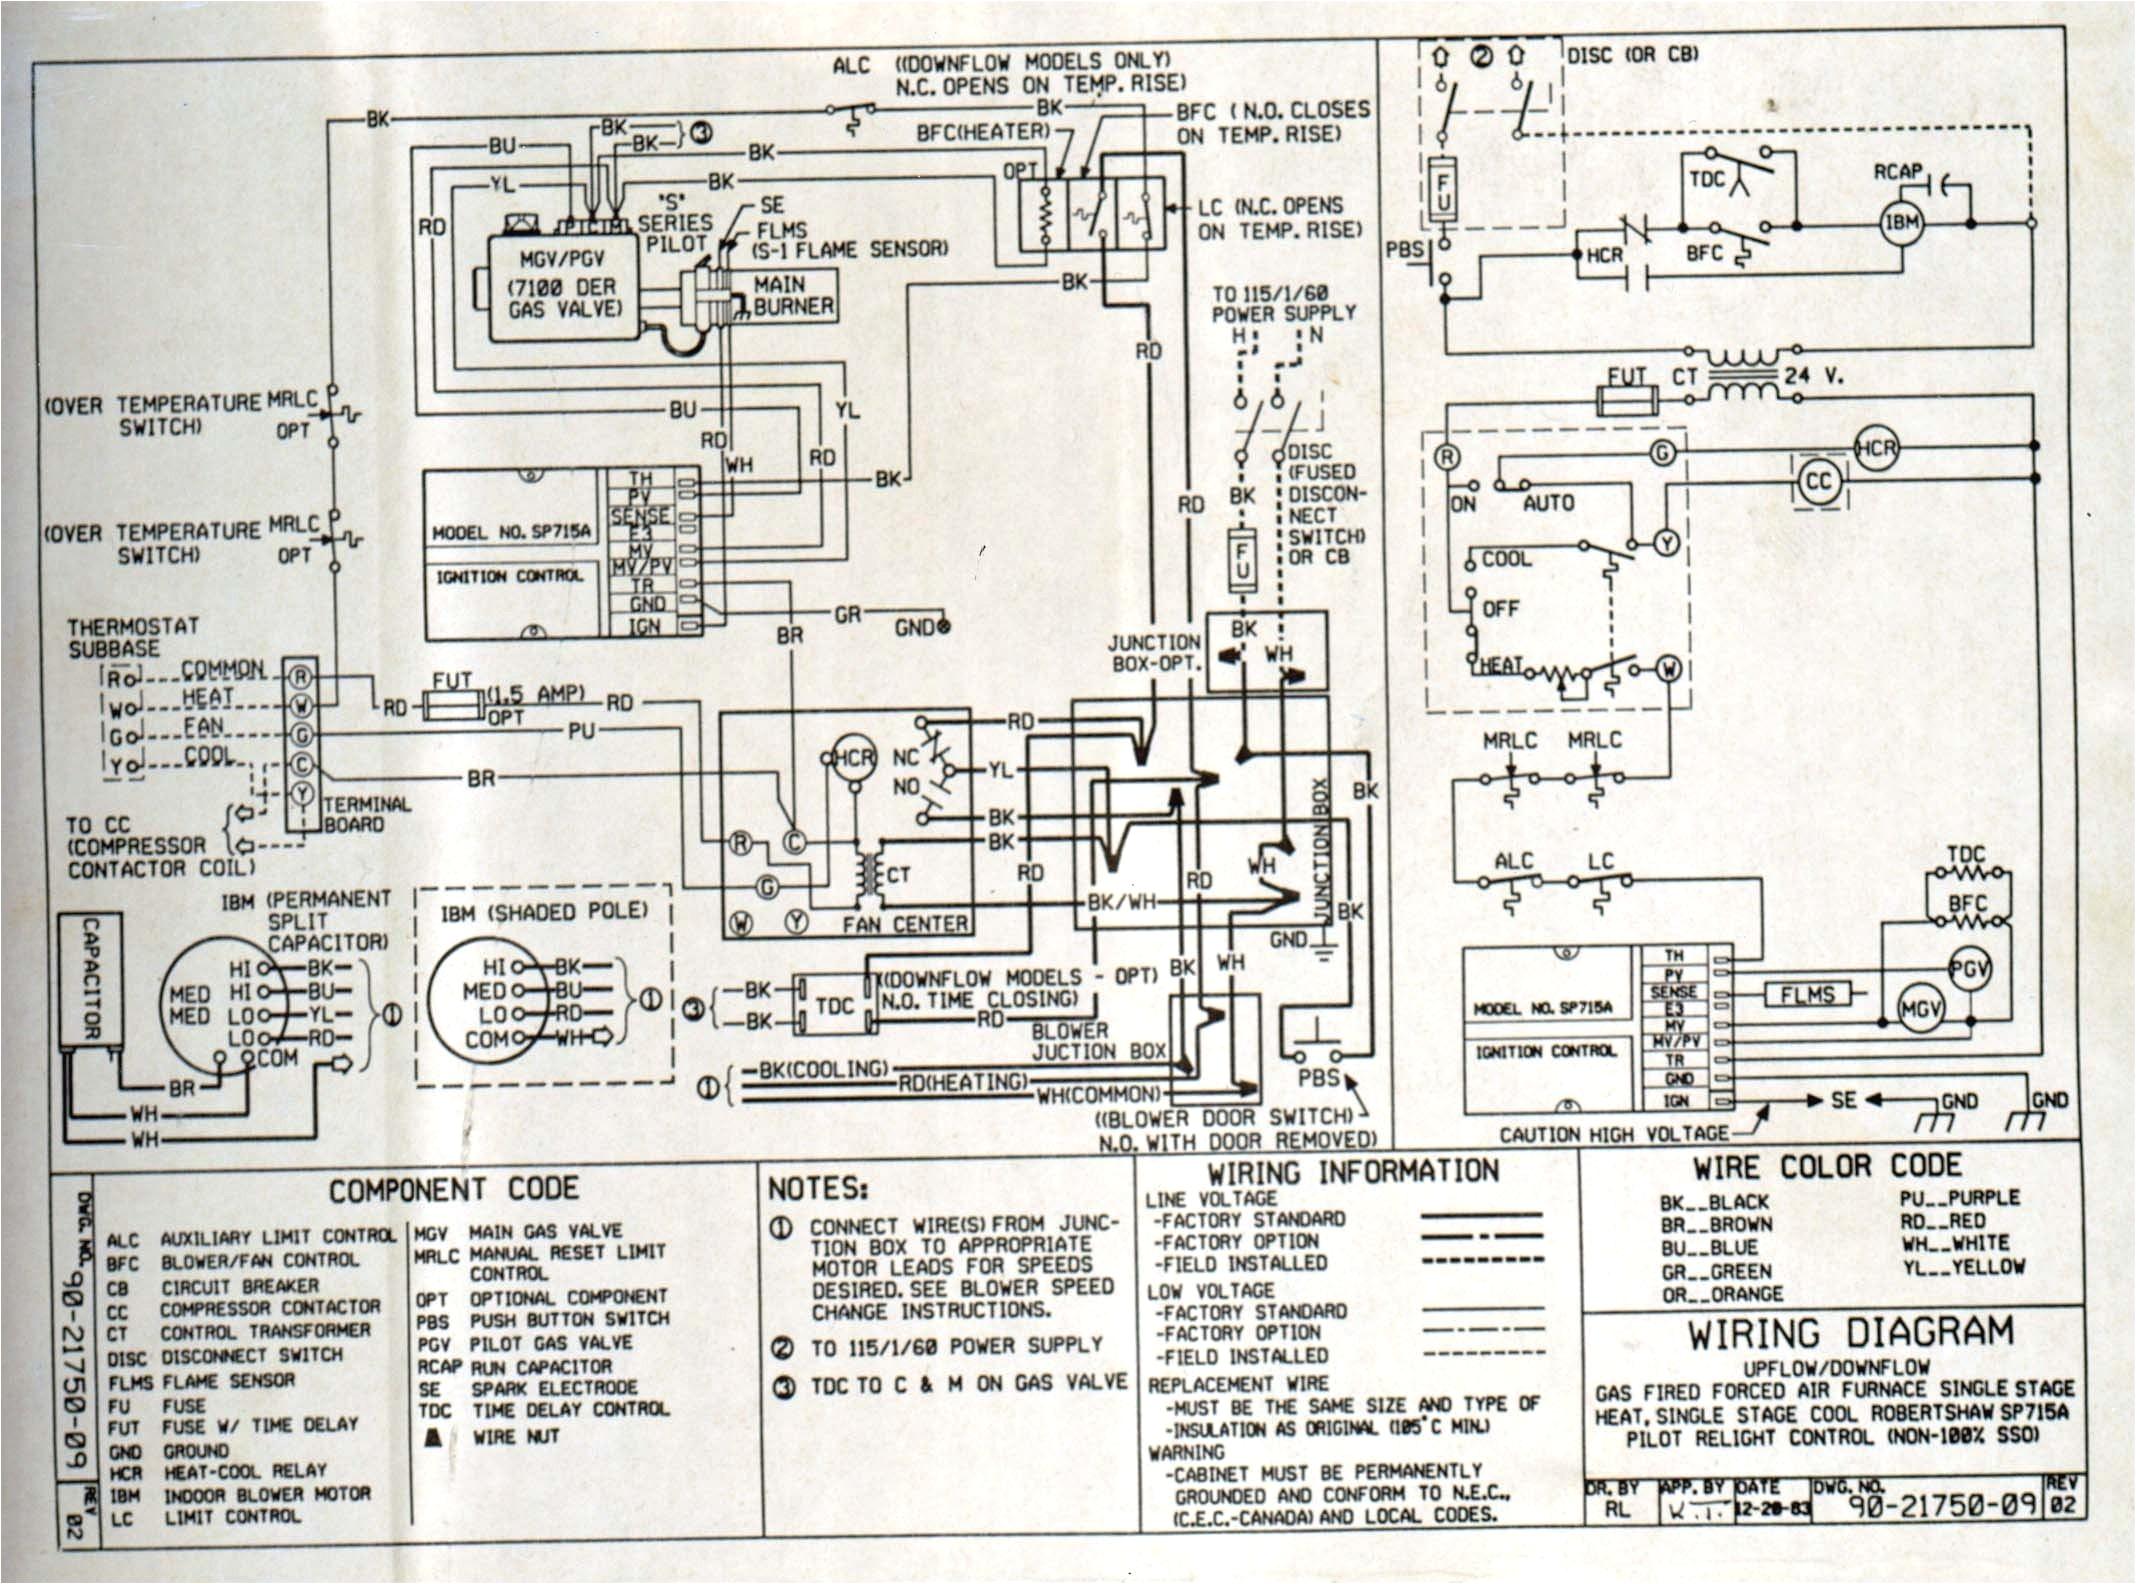 wiring diagram for lennox 89n18 wiring diagram mega wiring diagram for lennox 89n18